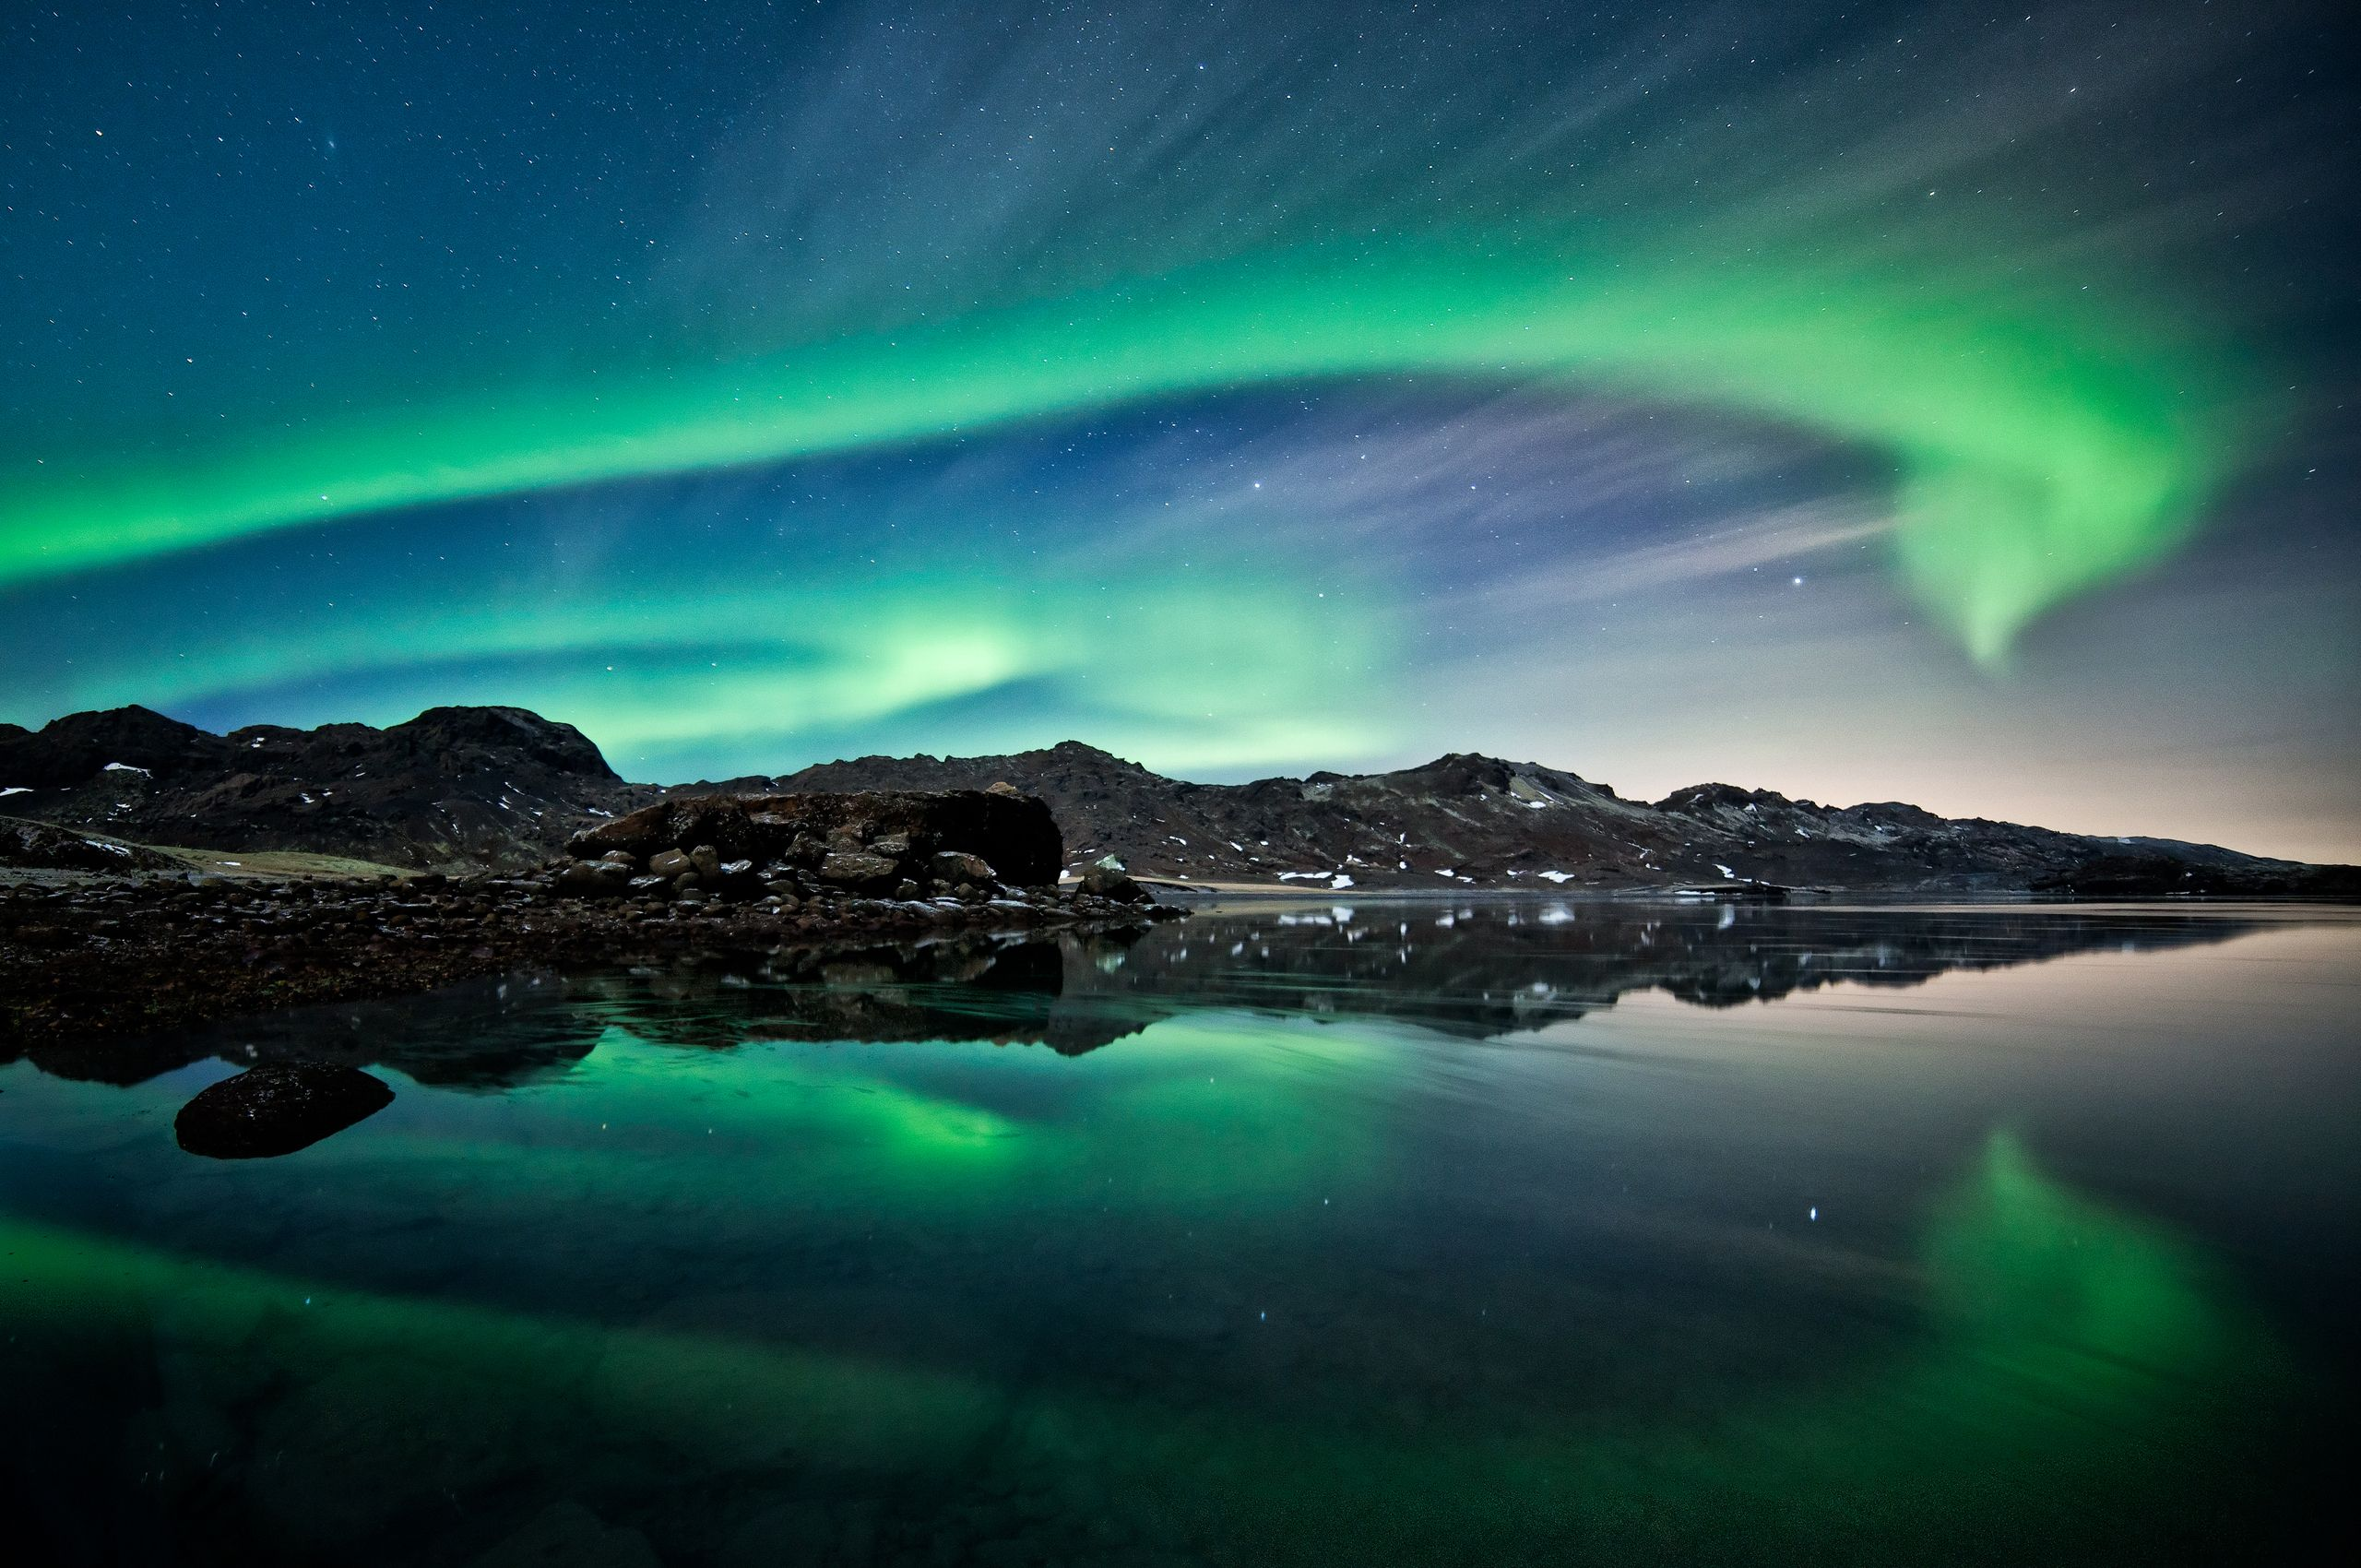 Beautiful Aurora Borealis Hd Wallpapers Jpg 2560 1700 Northern Lights Wallpaper Northern Lights Tours Aurora Boreal